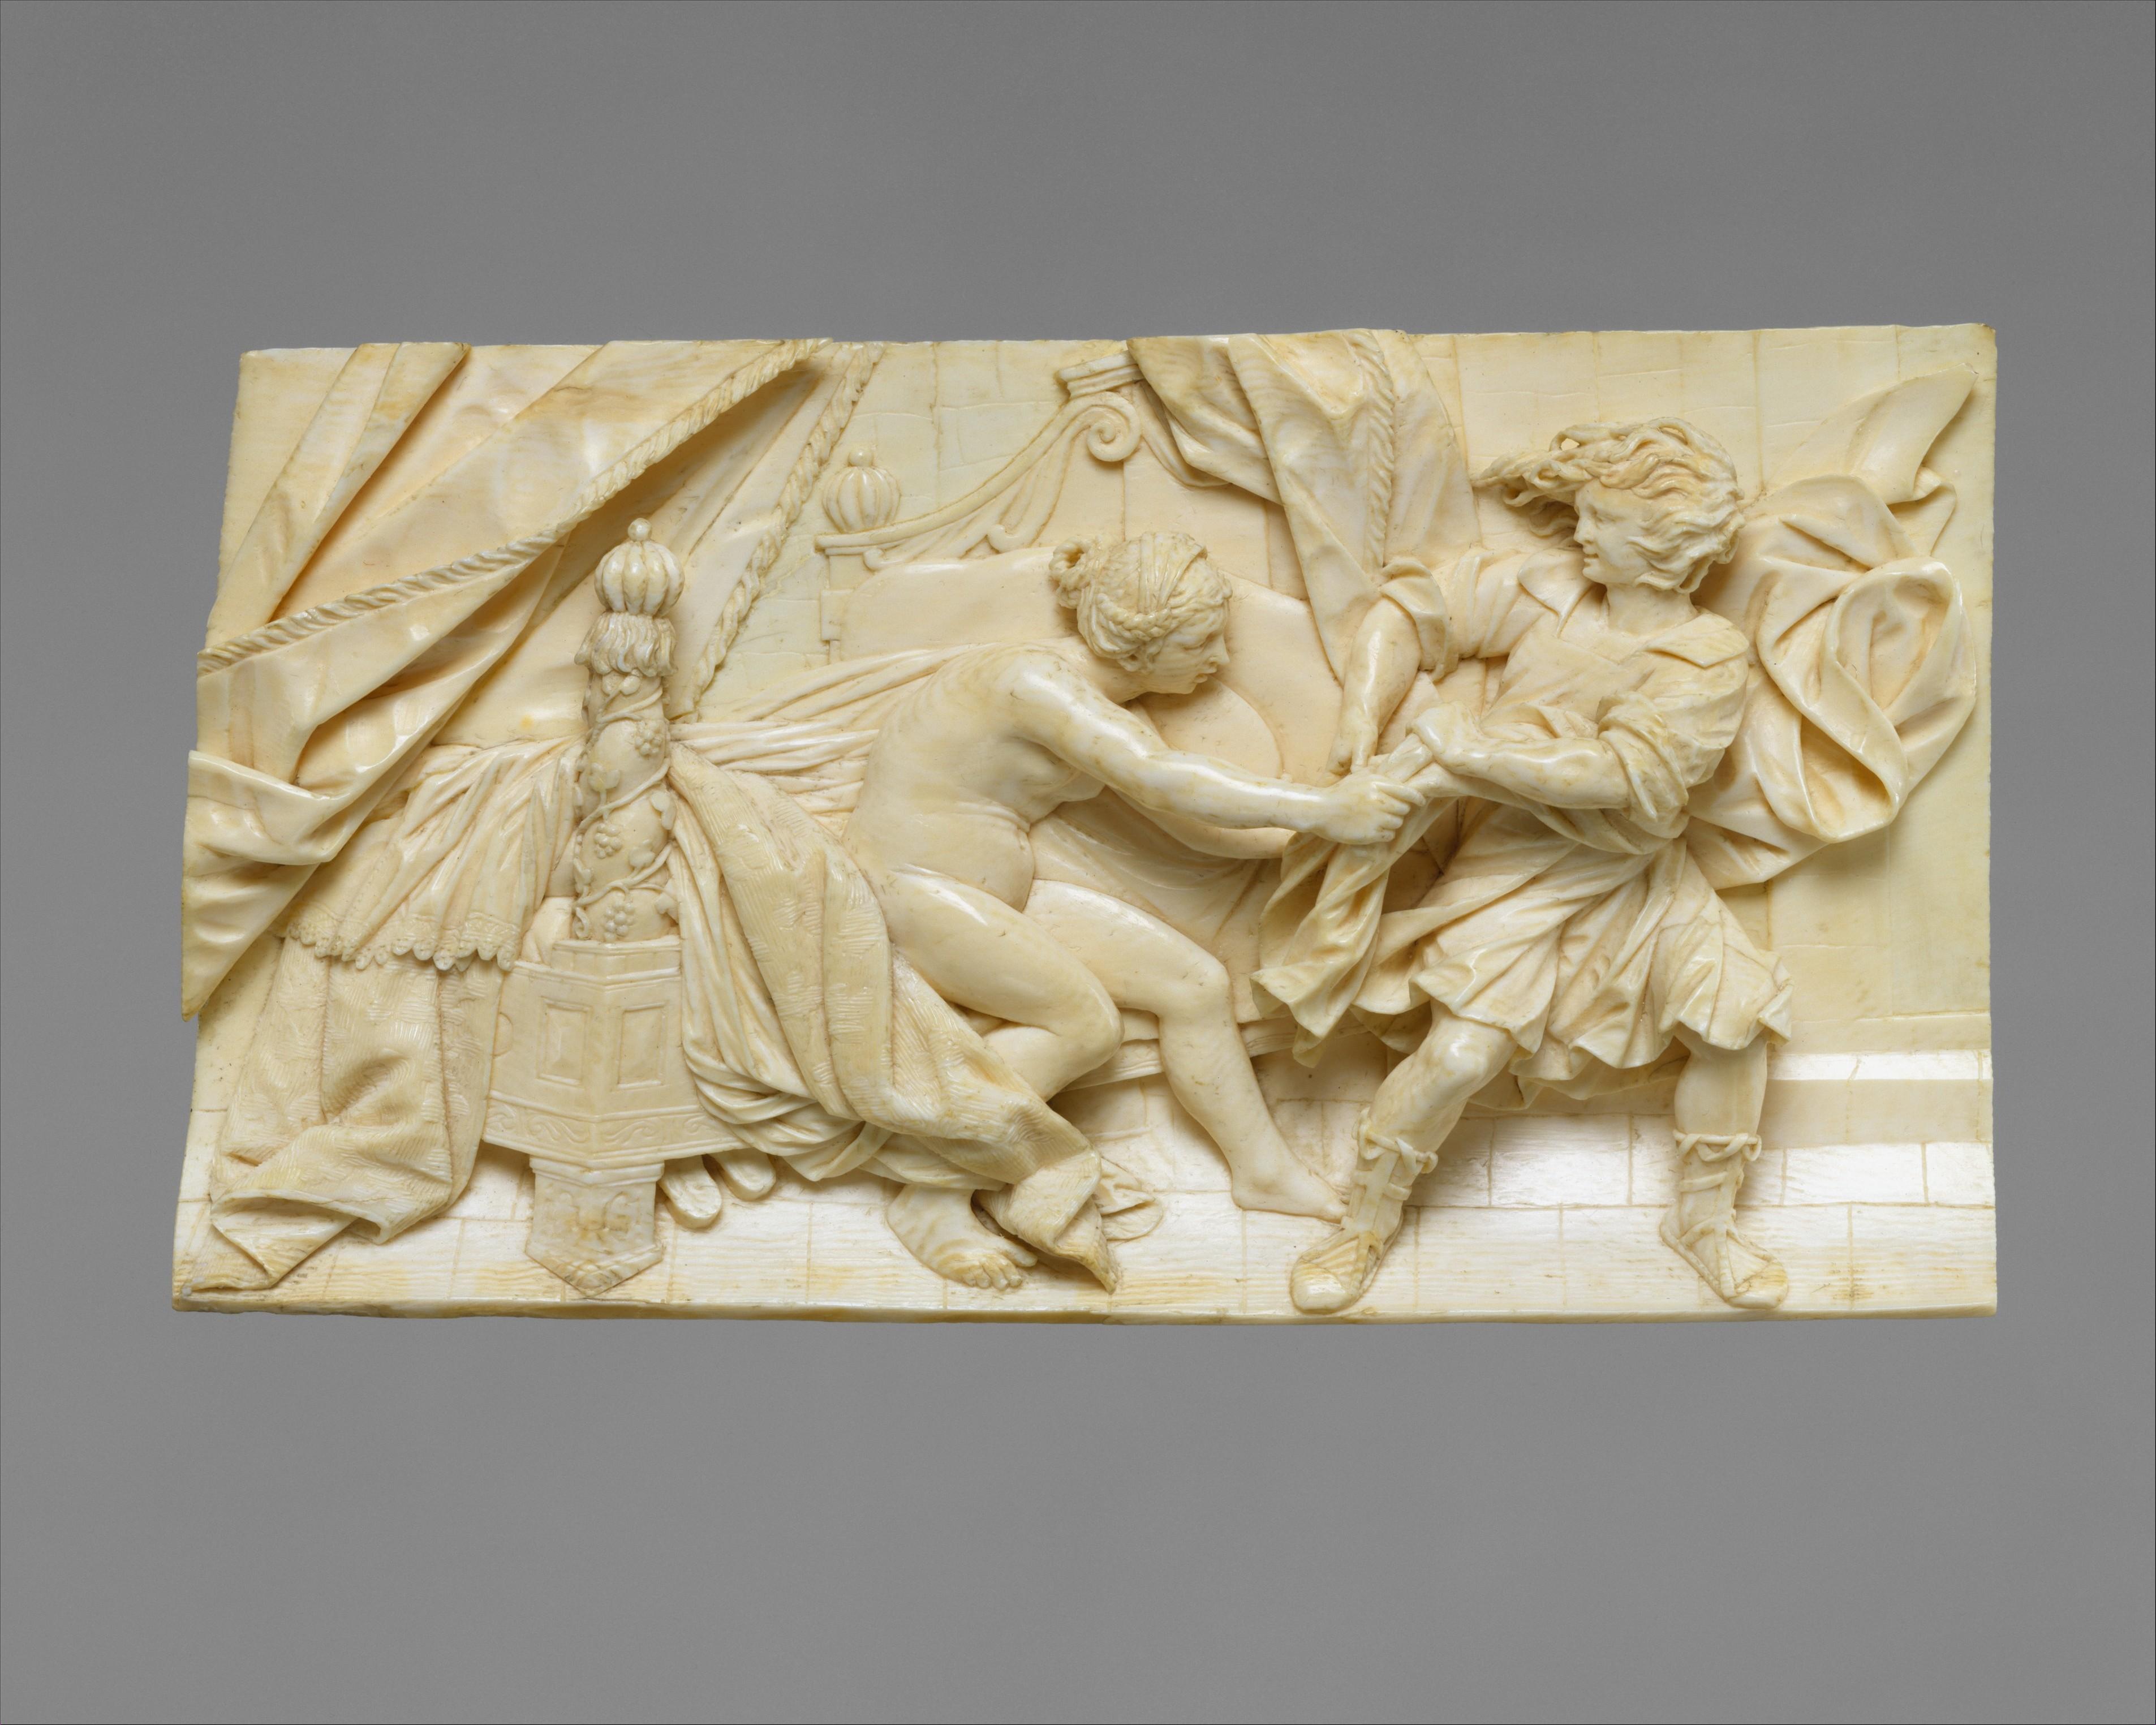 Balthasar Griessmann, Joseph and Potiphar's Wife